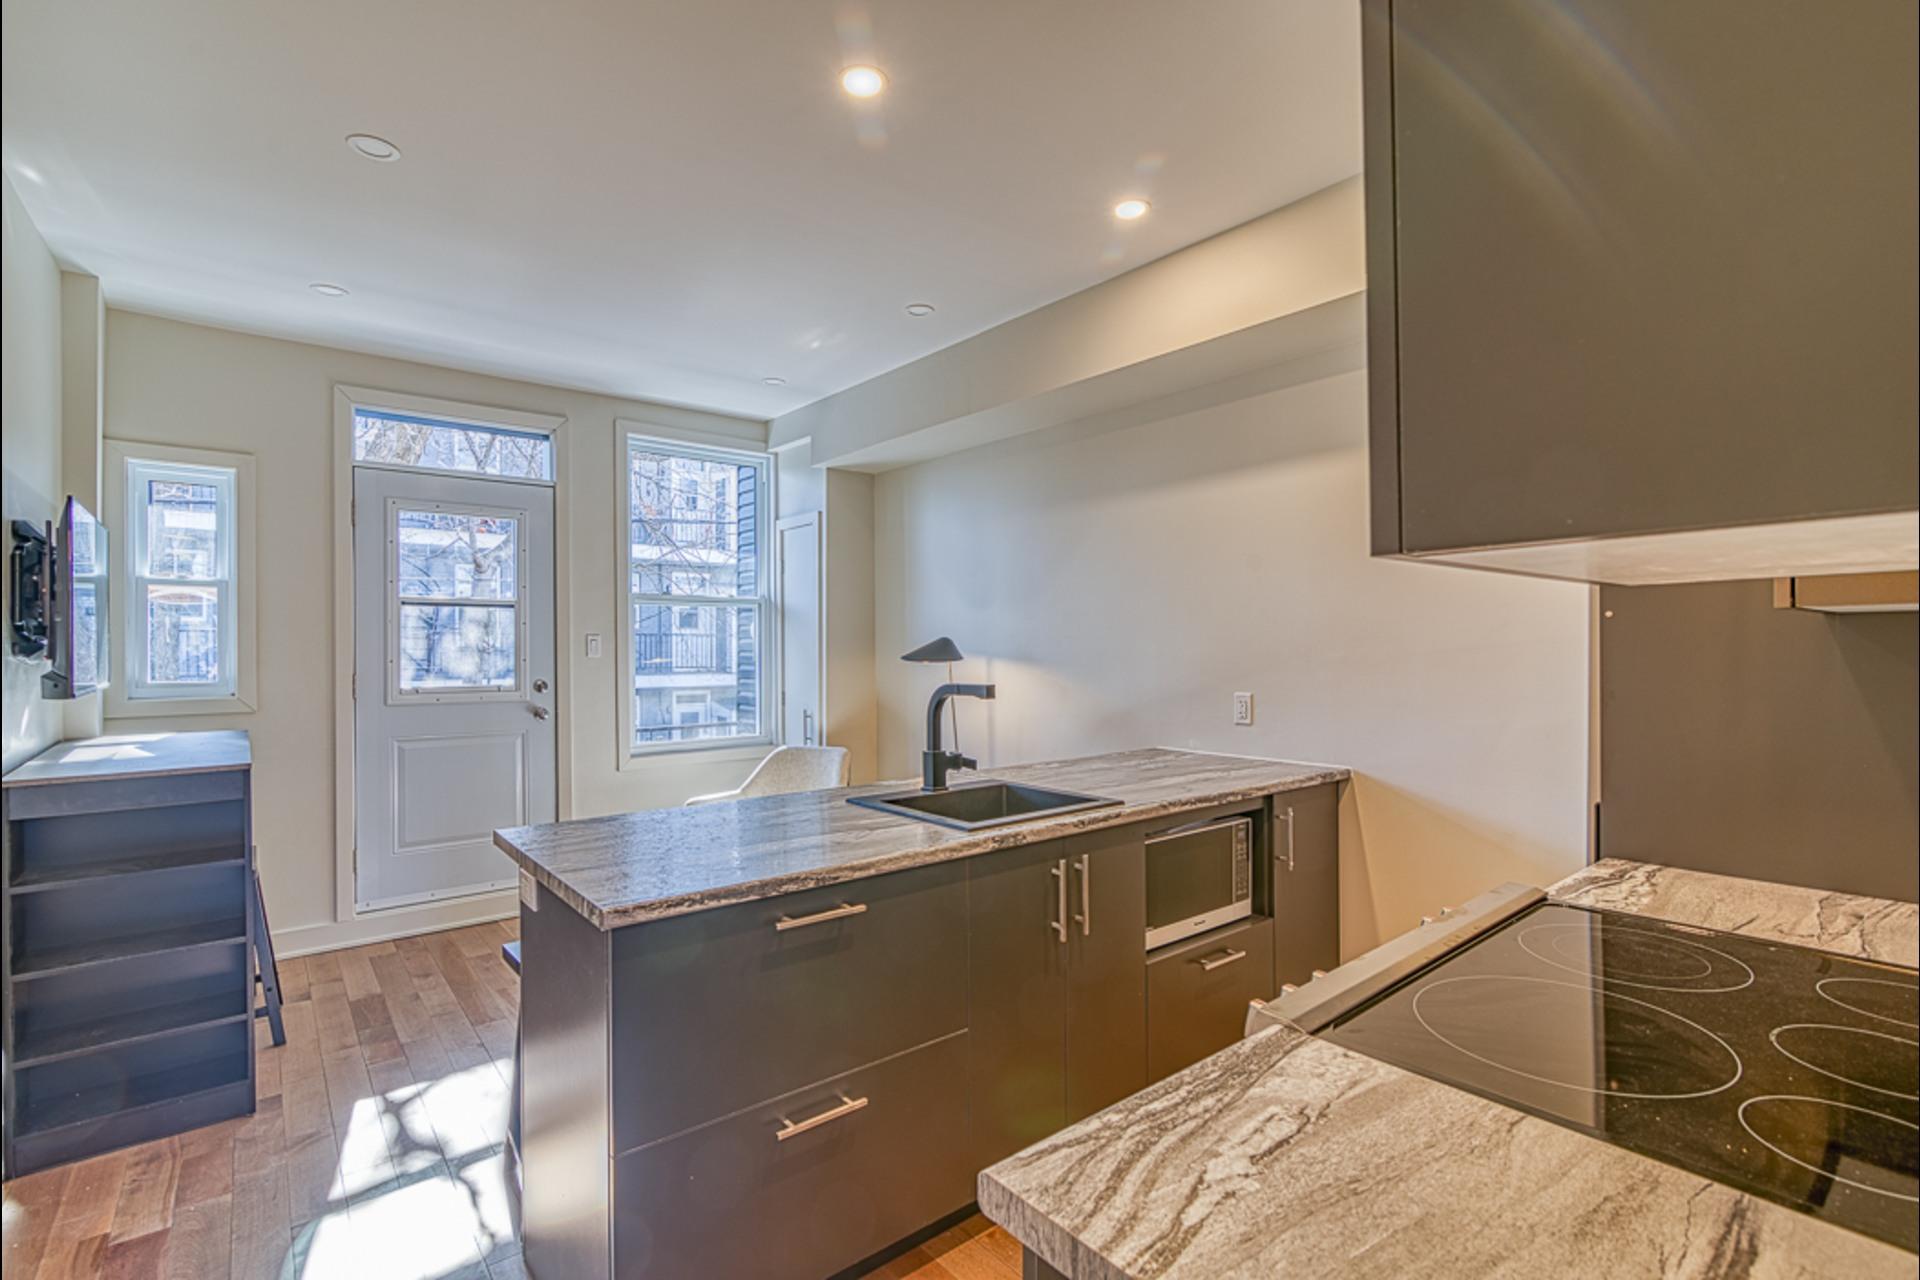 image 13 - Furnished Appartement For rent Montréal - 3 rooms